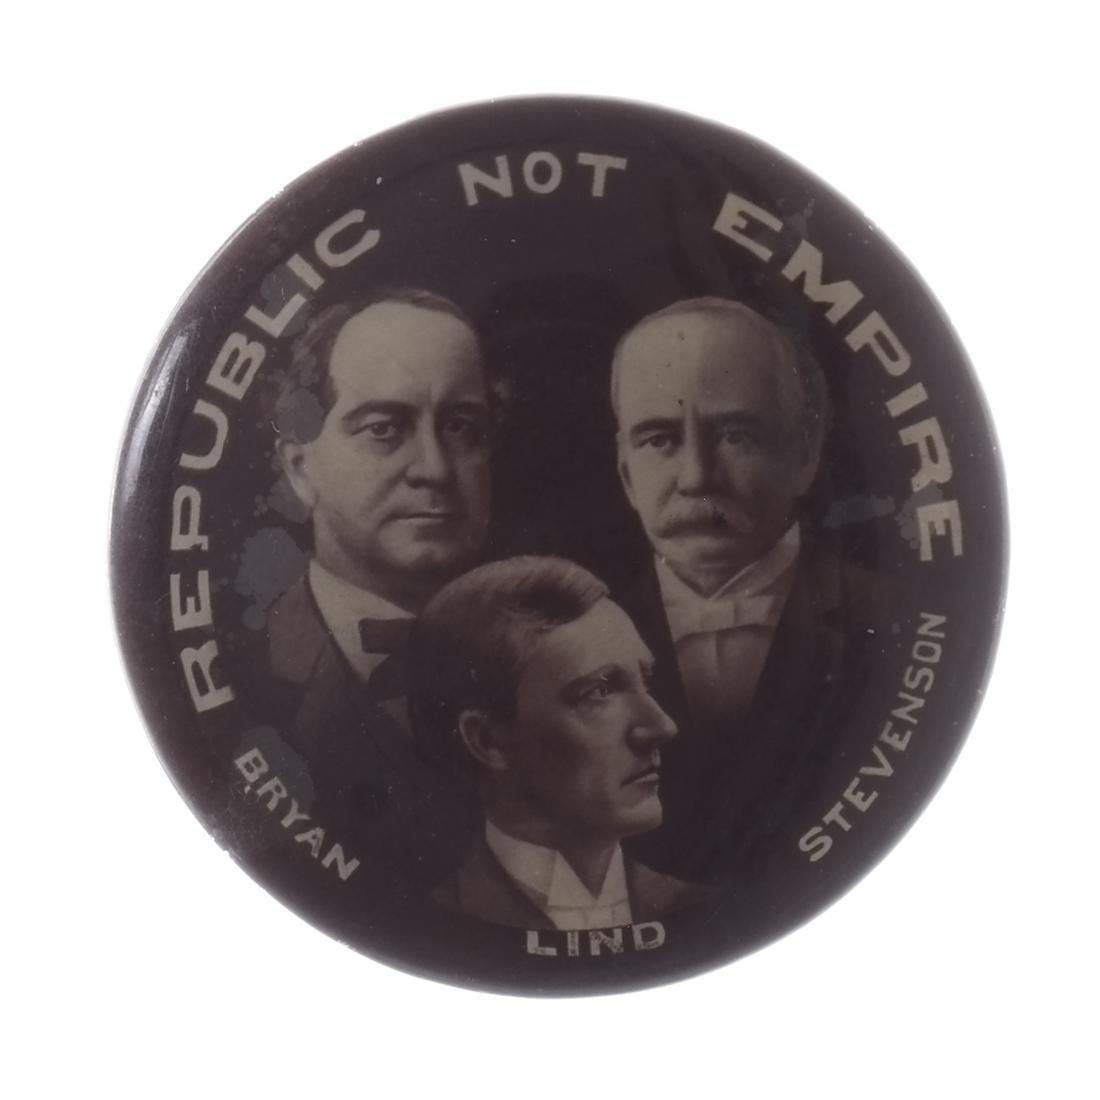 WILLIAM JENNINGS BRYAN - 1896 TRIGATE PIN BACK BUTTON